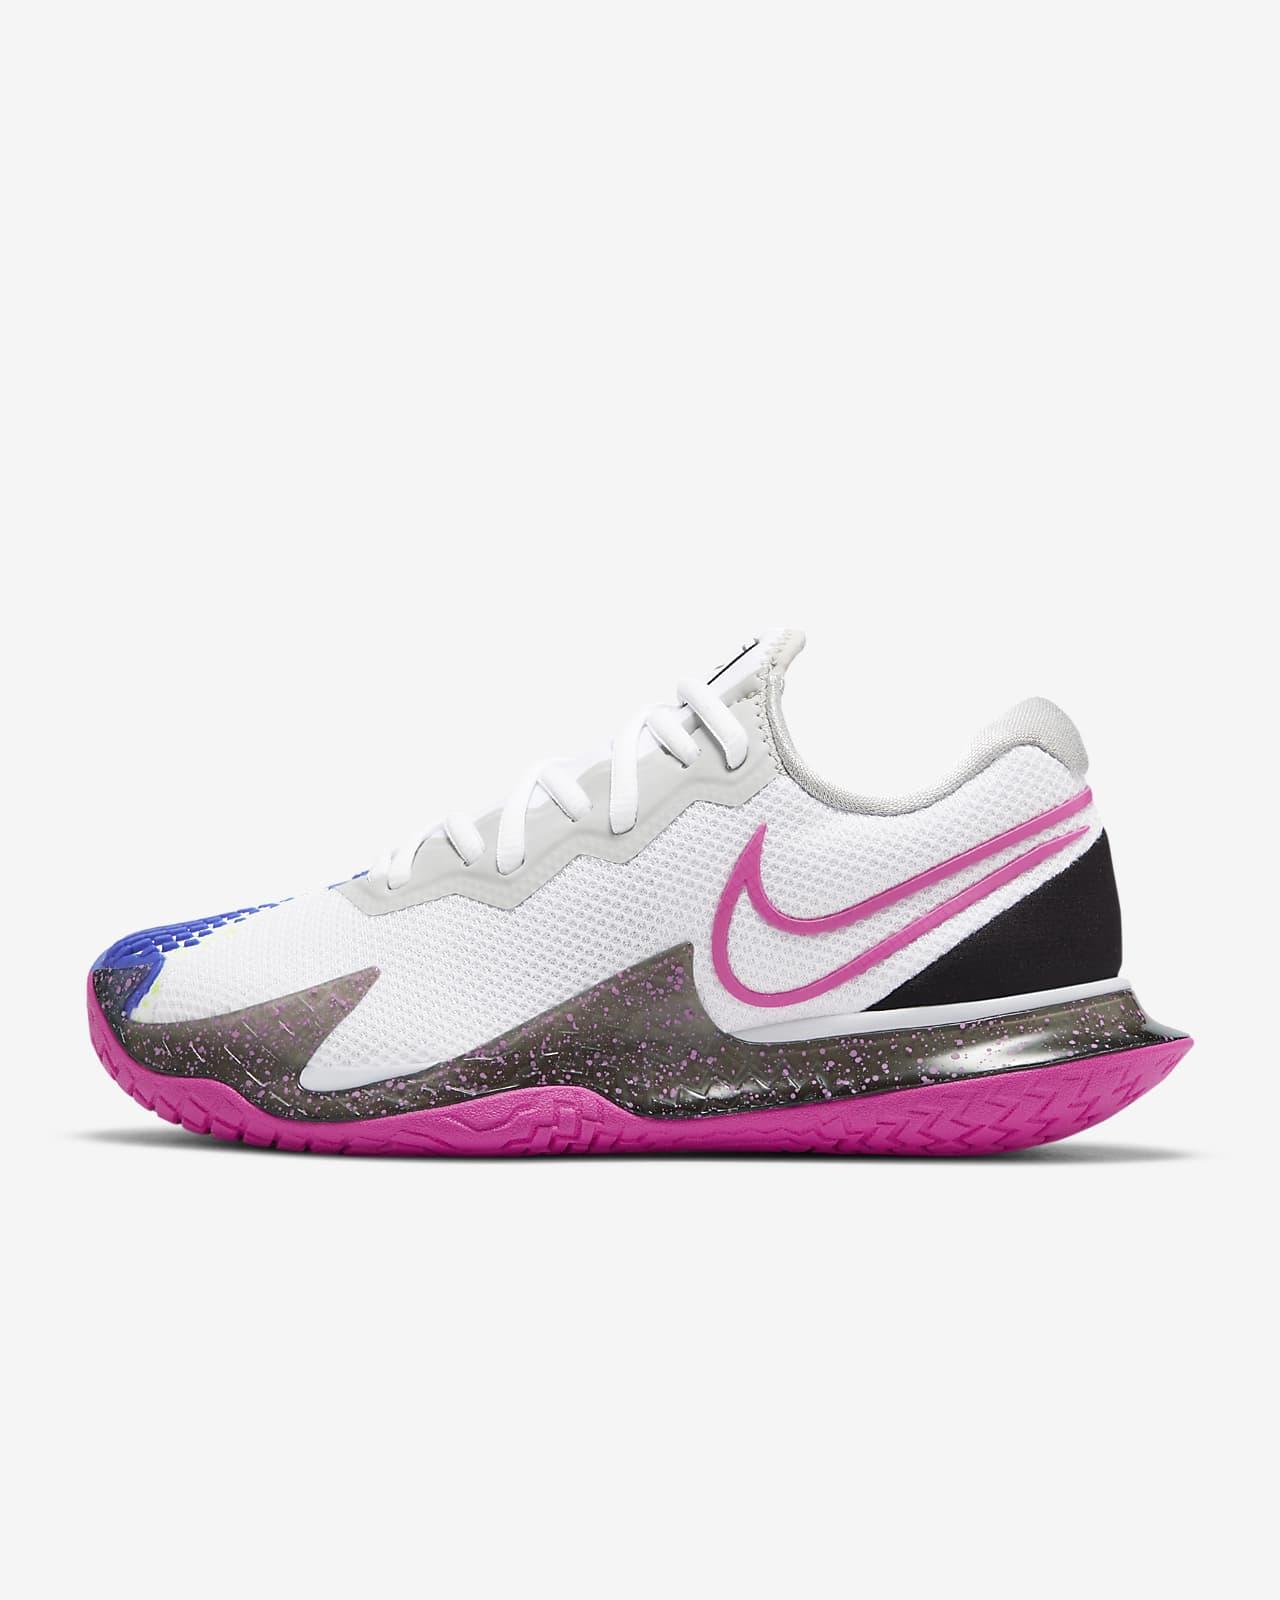 Calzado de tenis de cancha dura para mujer NikeCourt Air Zoom Vapor Cage 4